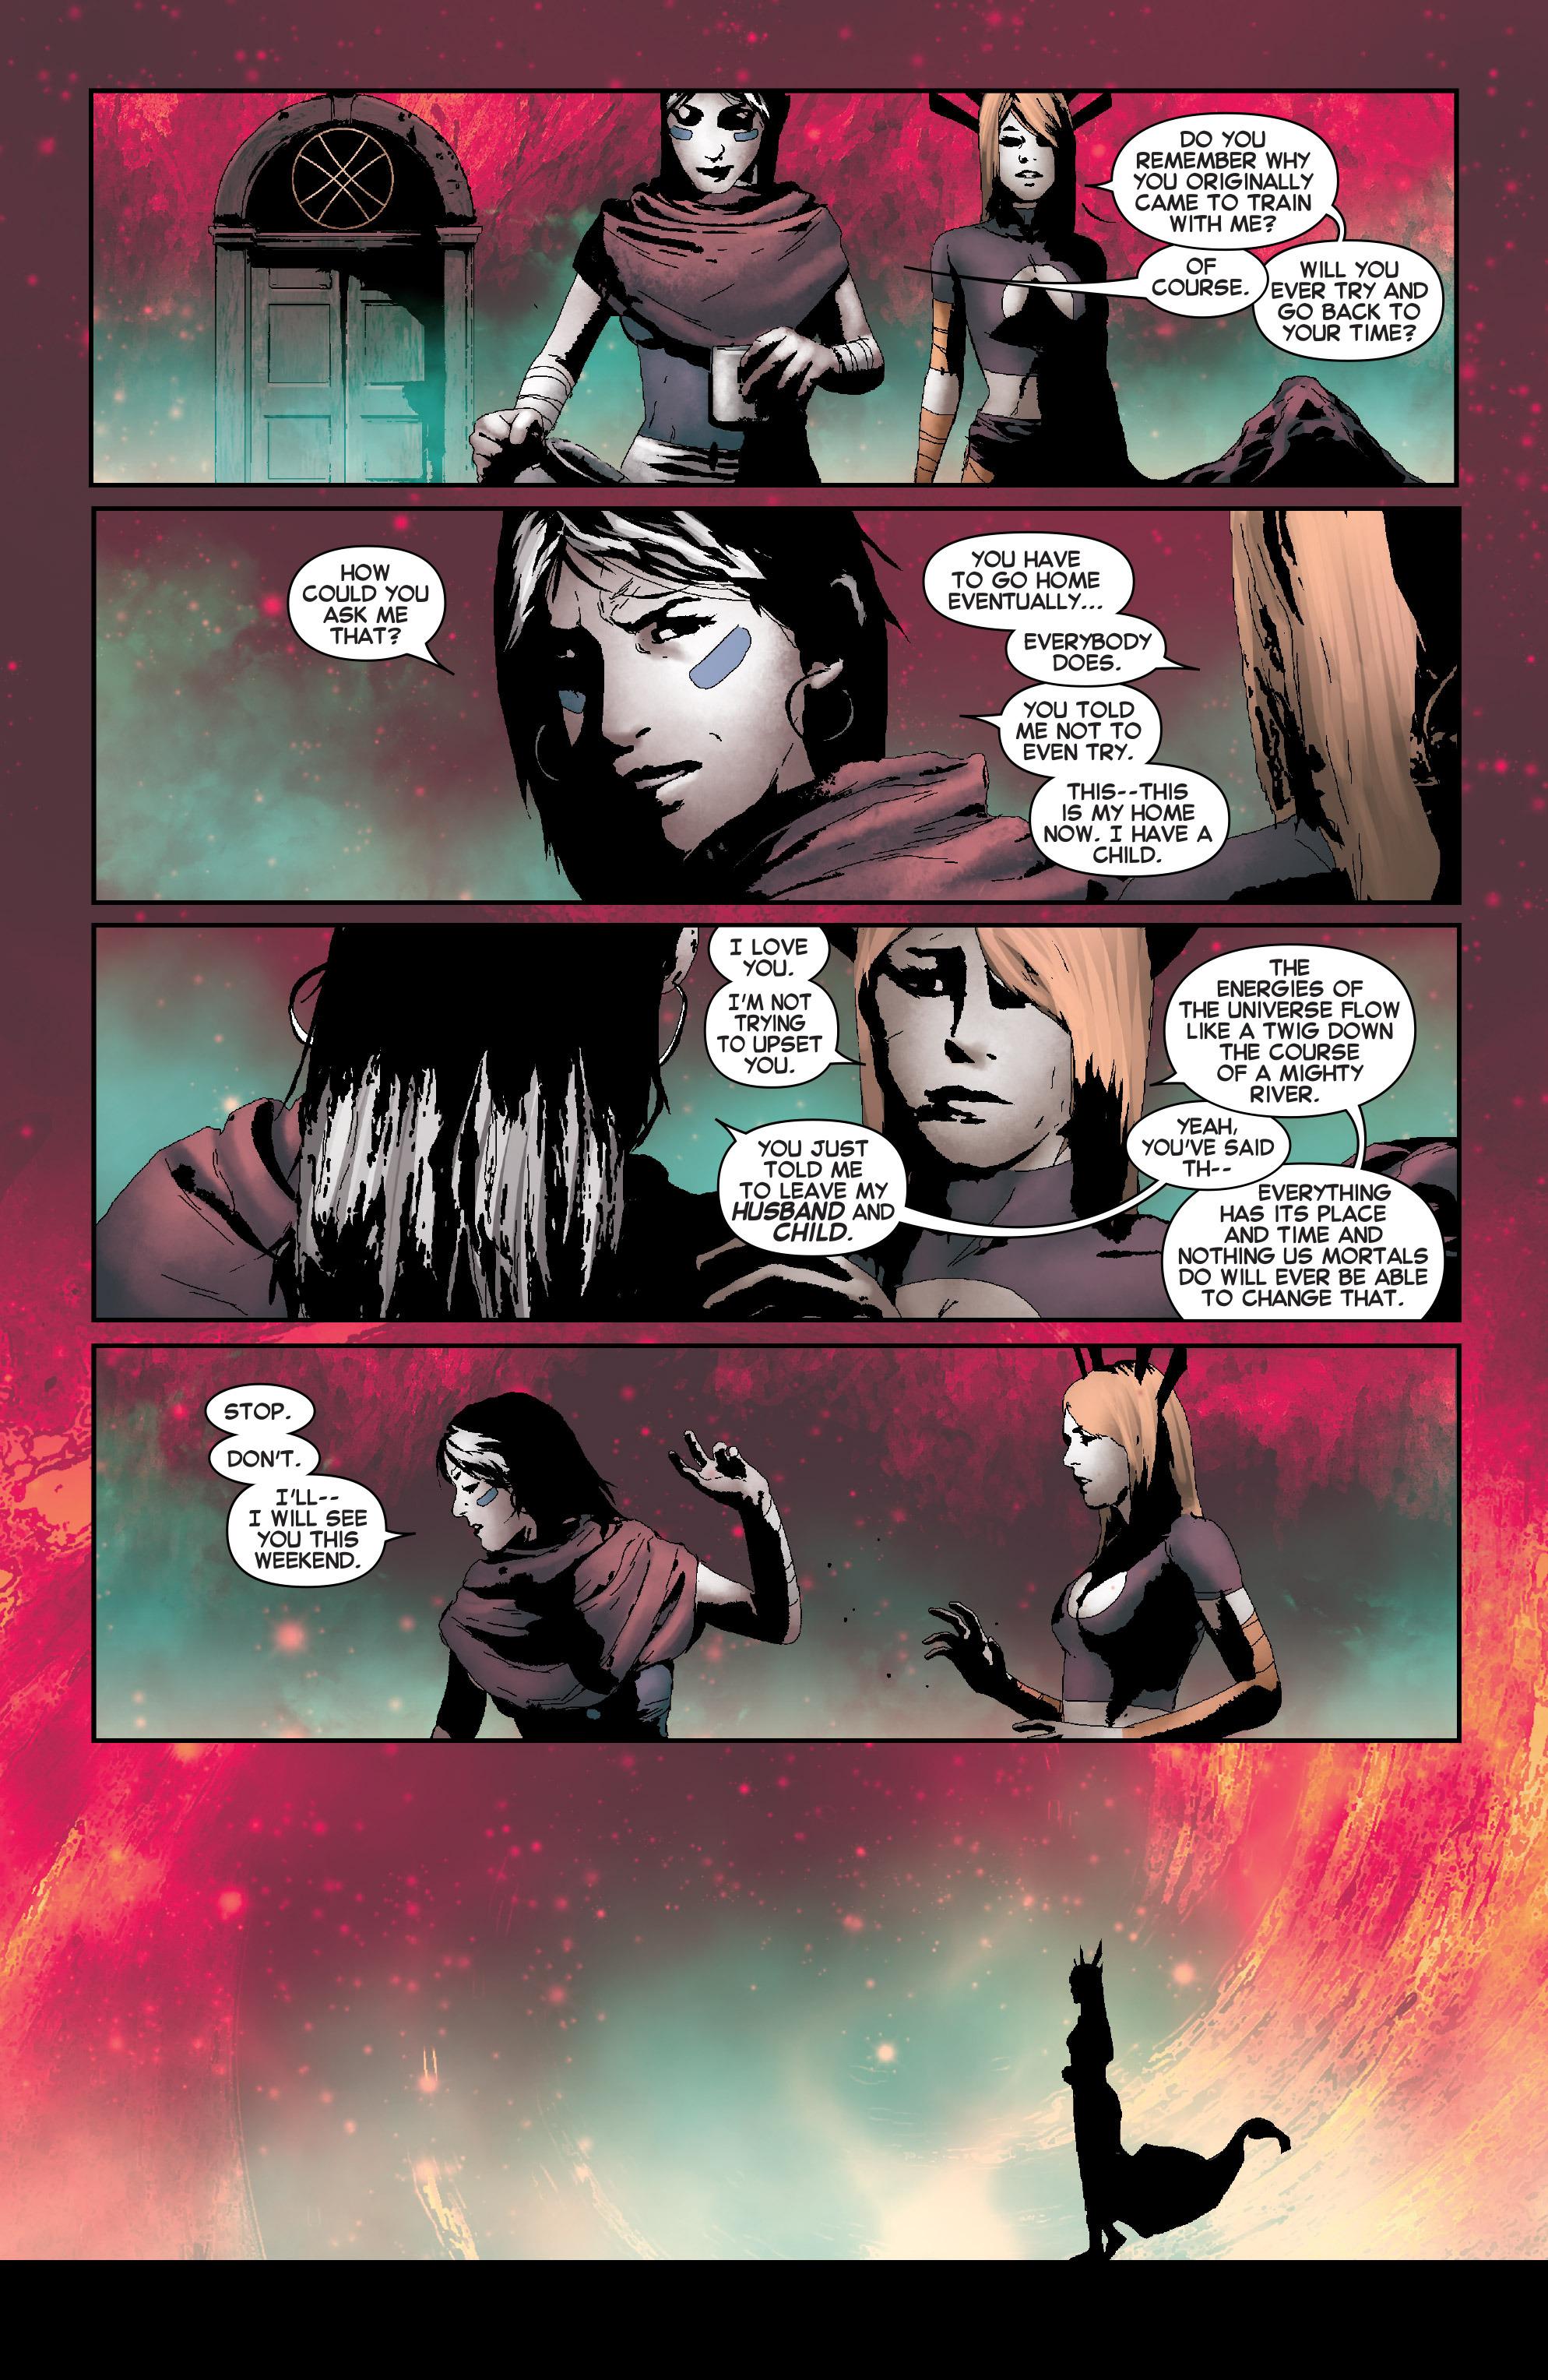 Read online Uncanny X-Men (2013) comic -  Issue # Annual 1 - 20